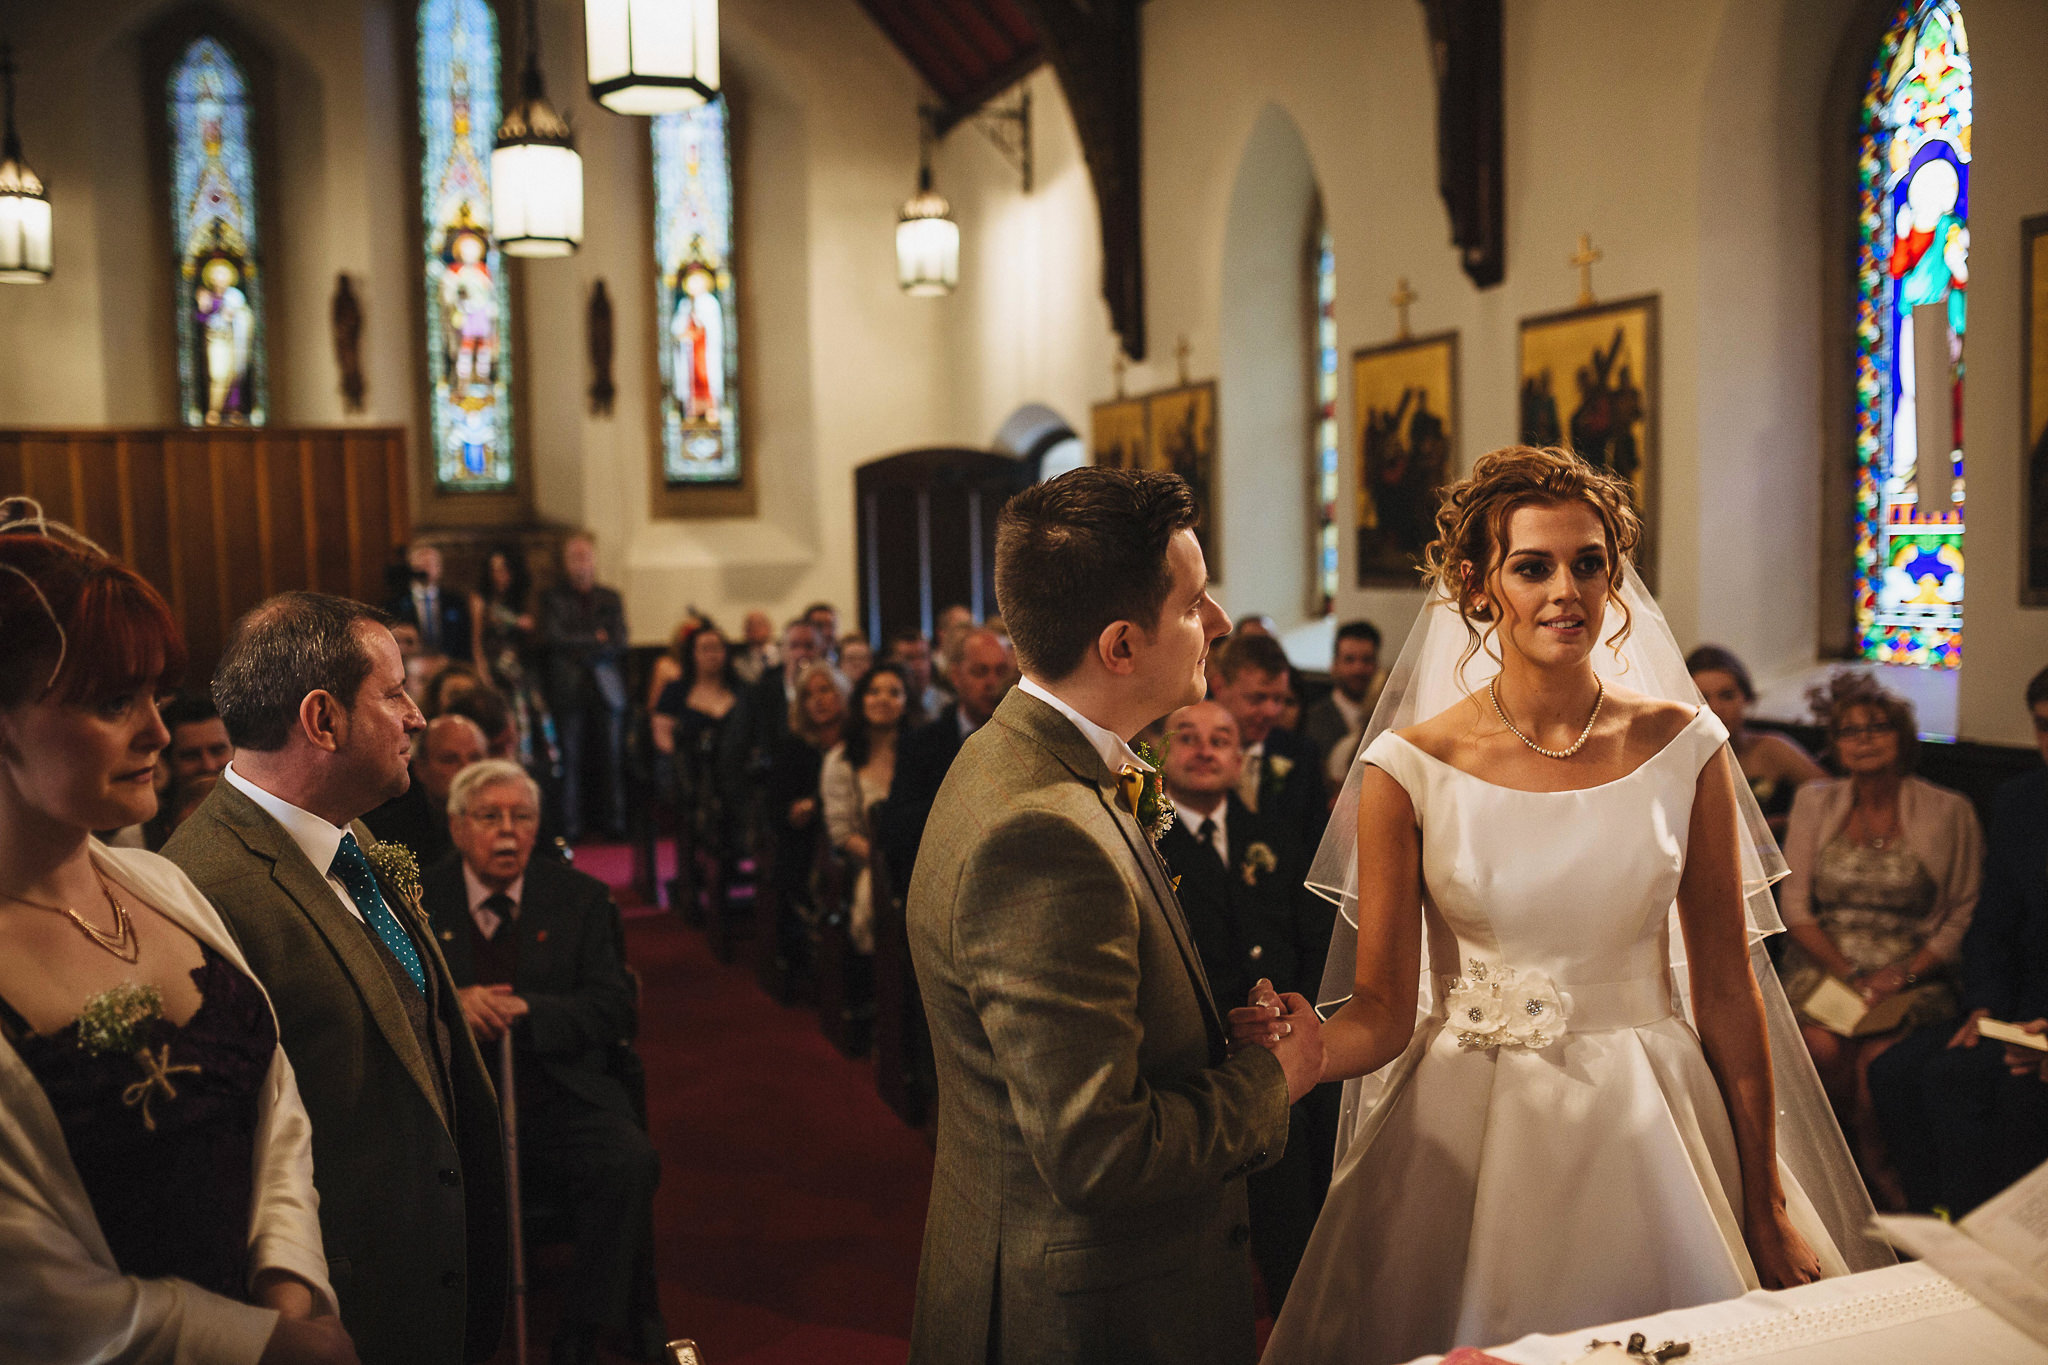 Lancashire-Creative-natural-documentary-wedding-photography-90032